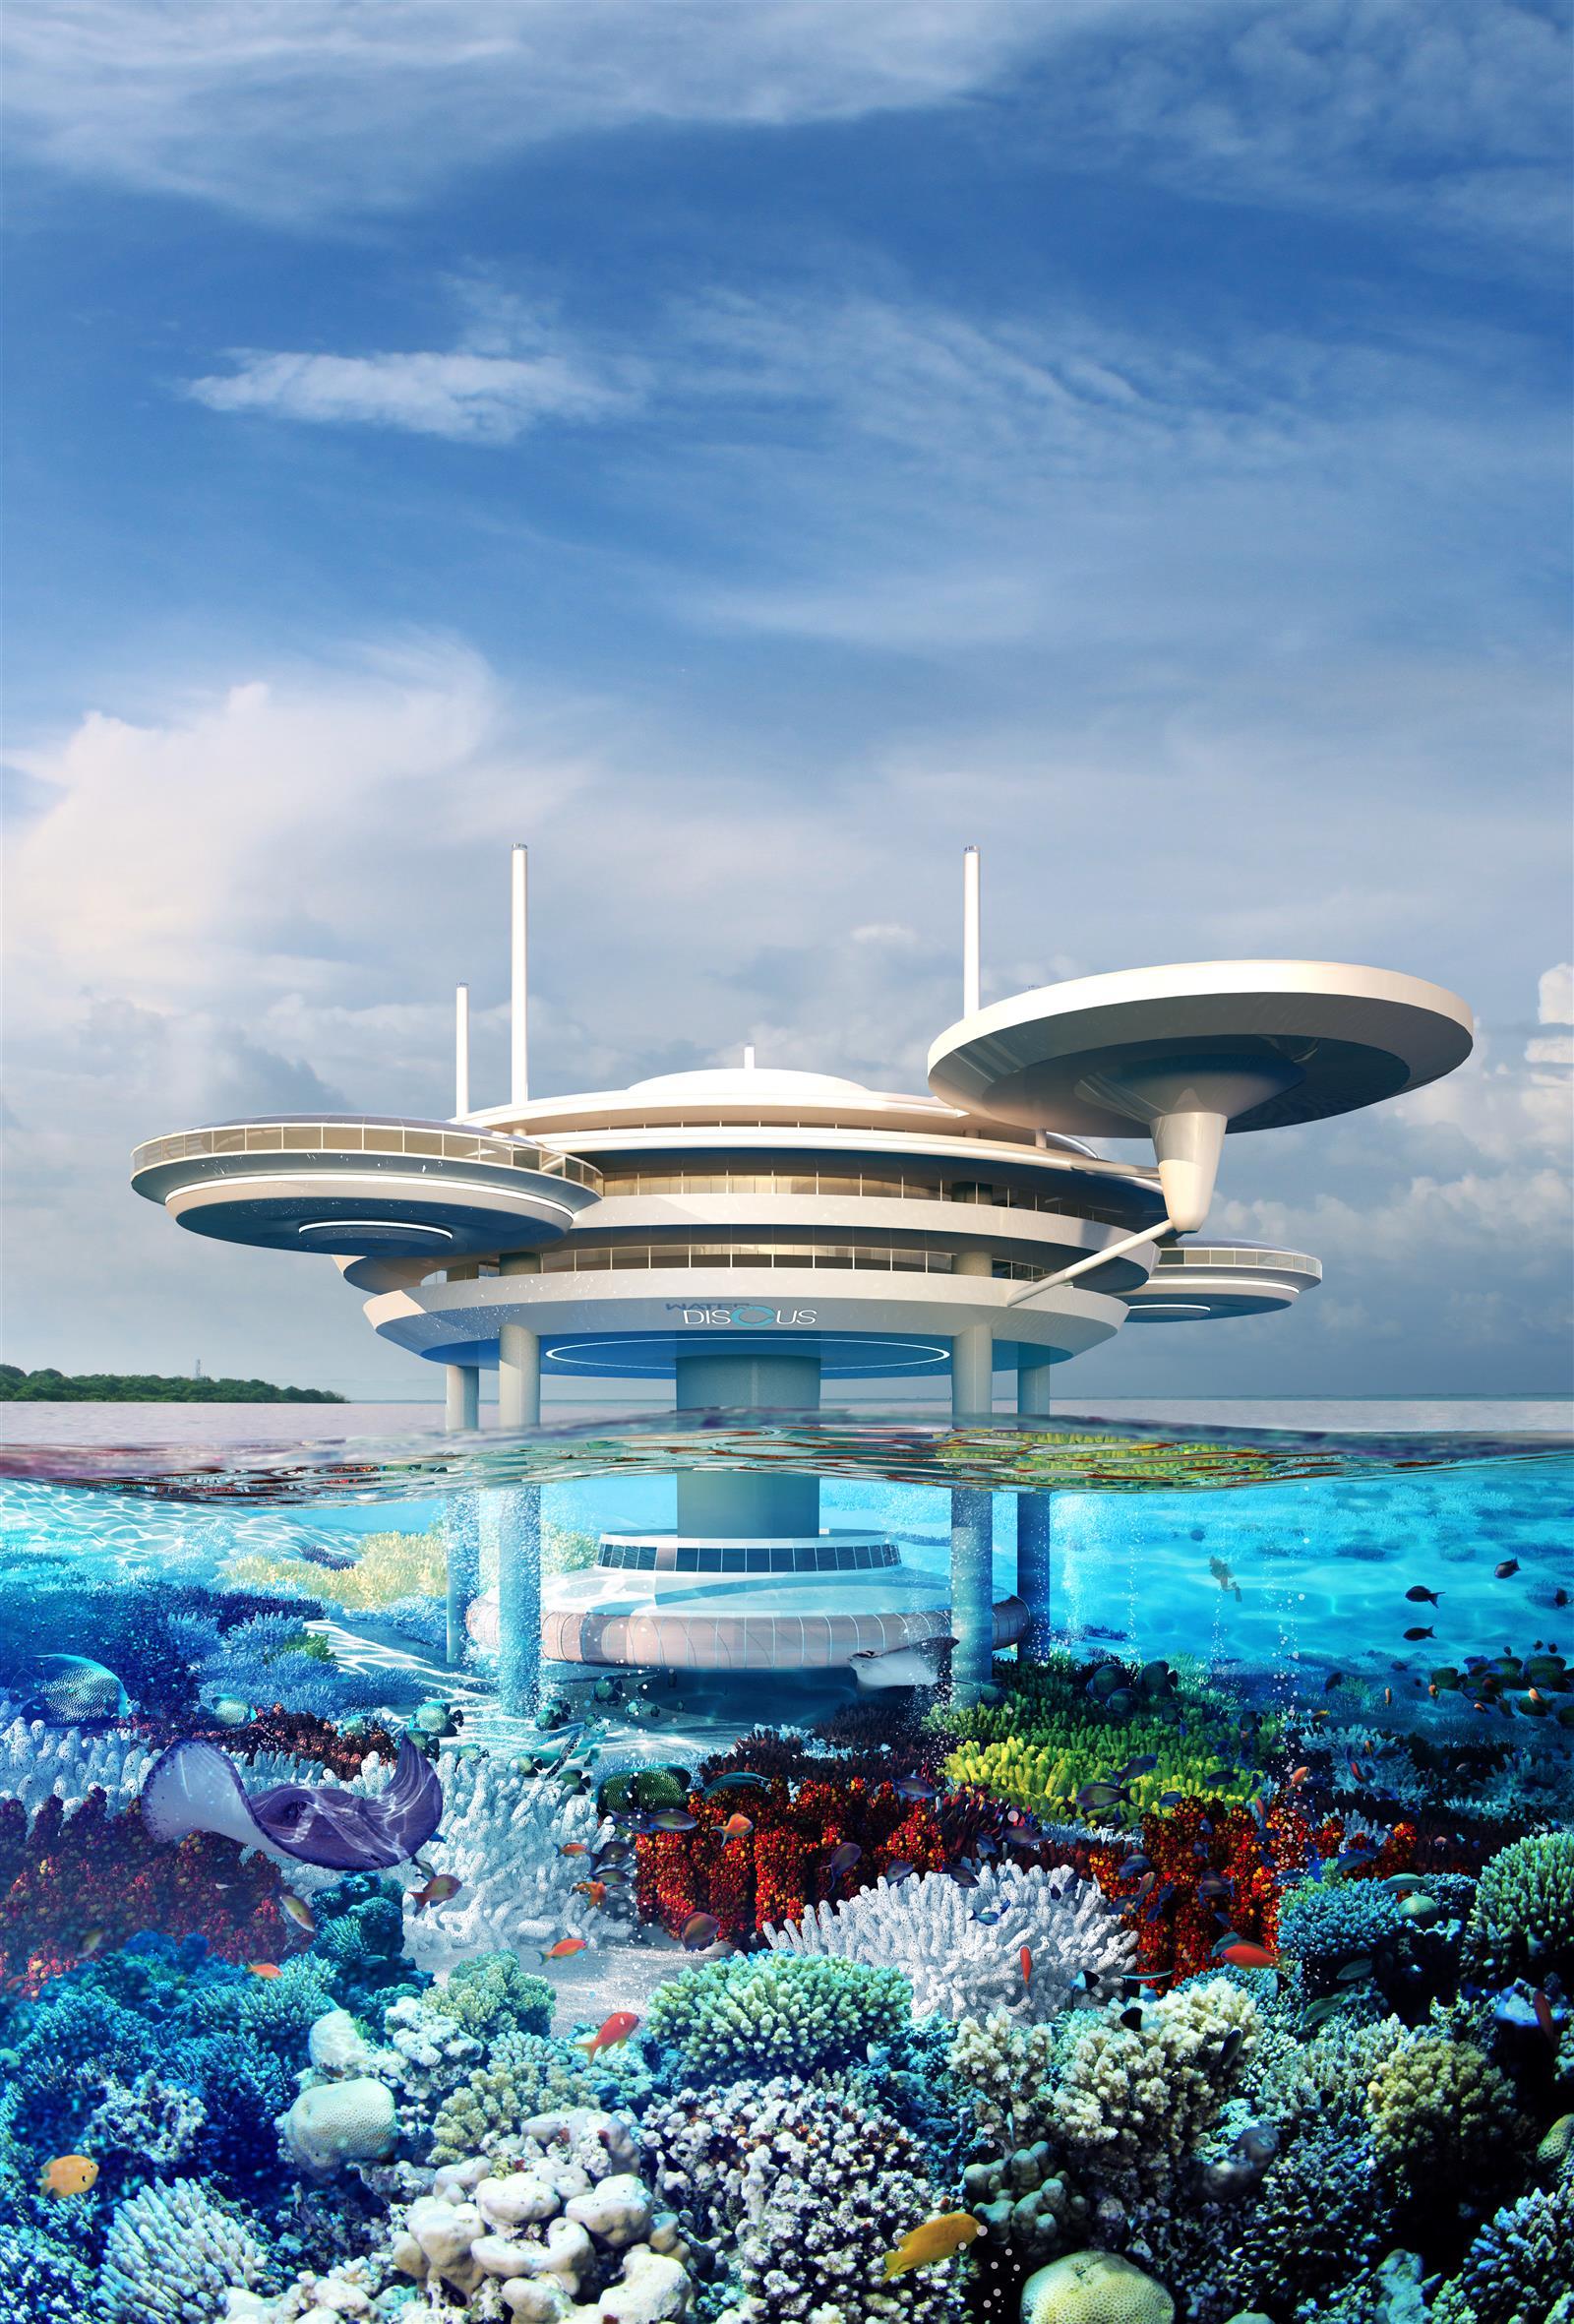 Water Discus Underwater Hotels In Dubai (4)